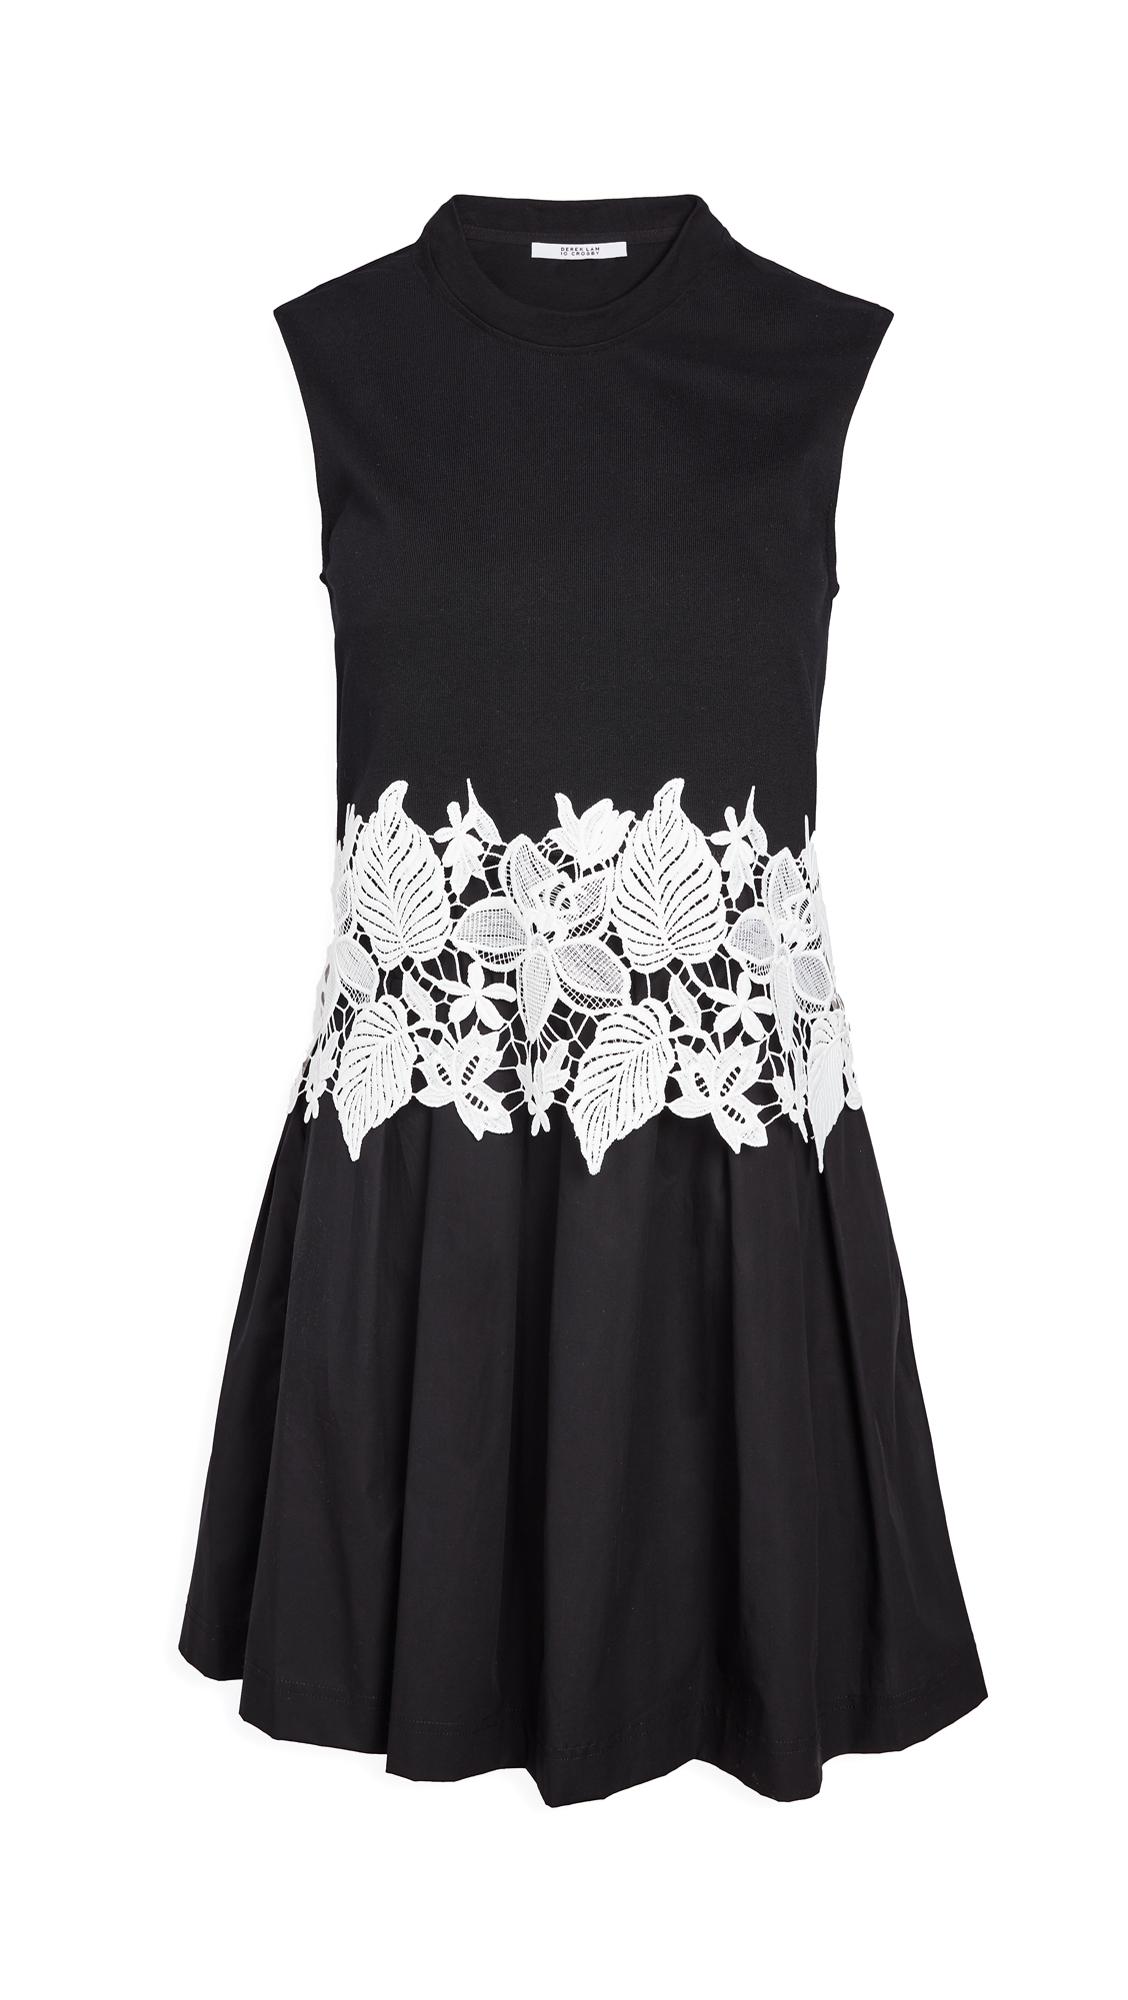 Photo of Derek Lam 10 Crosby Lea Sleeveless 2-in-1 Dress - shop Derek Lam 10 Crosby Clothing, Dresses online